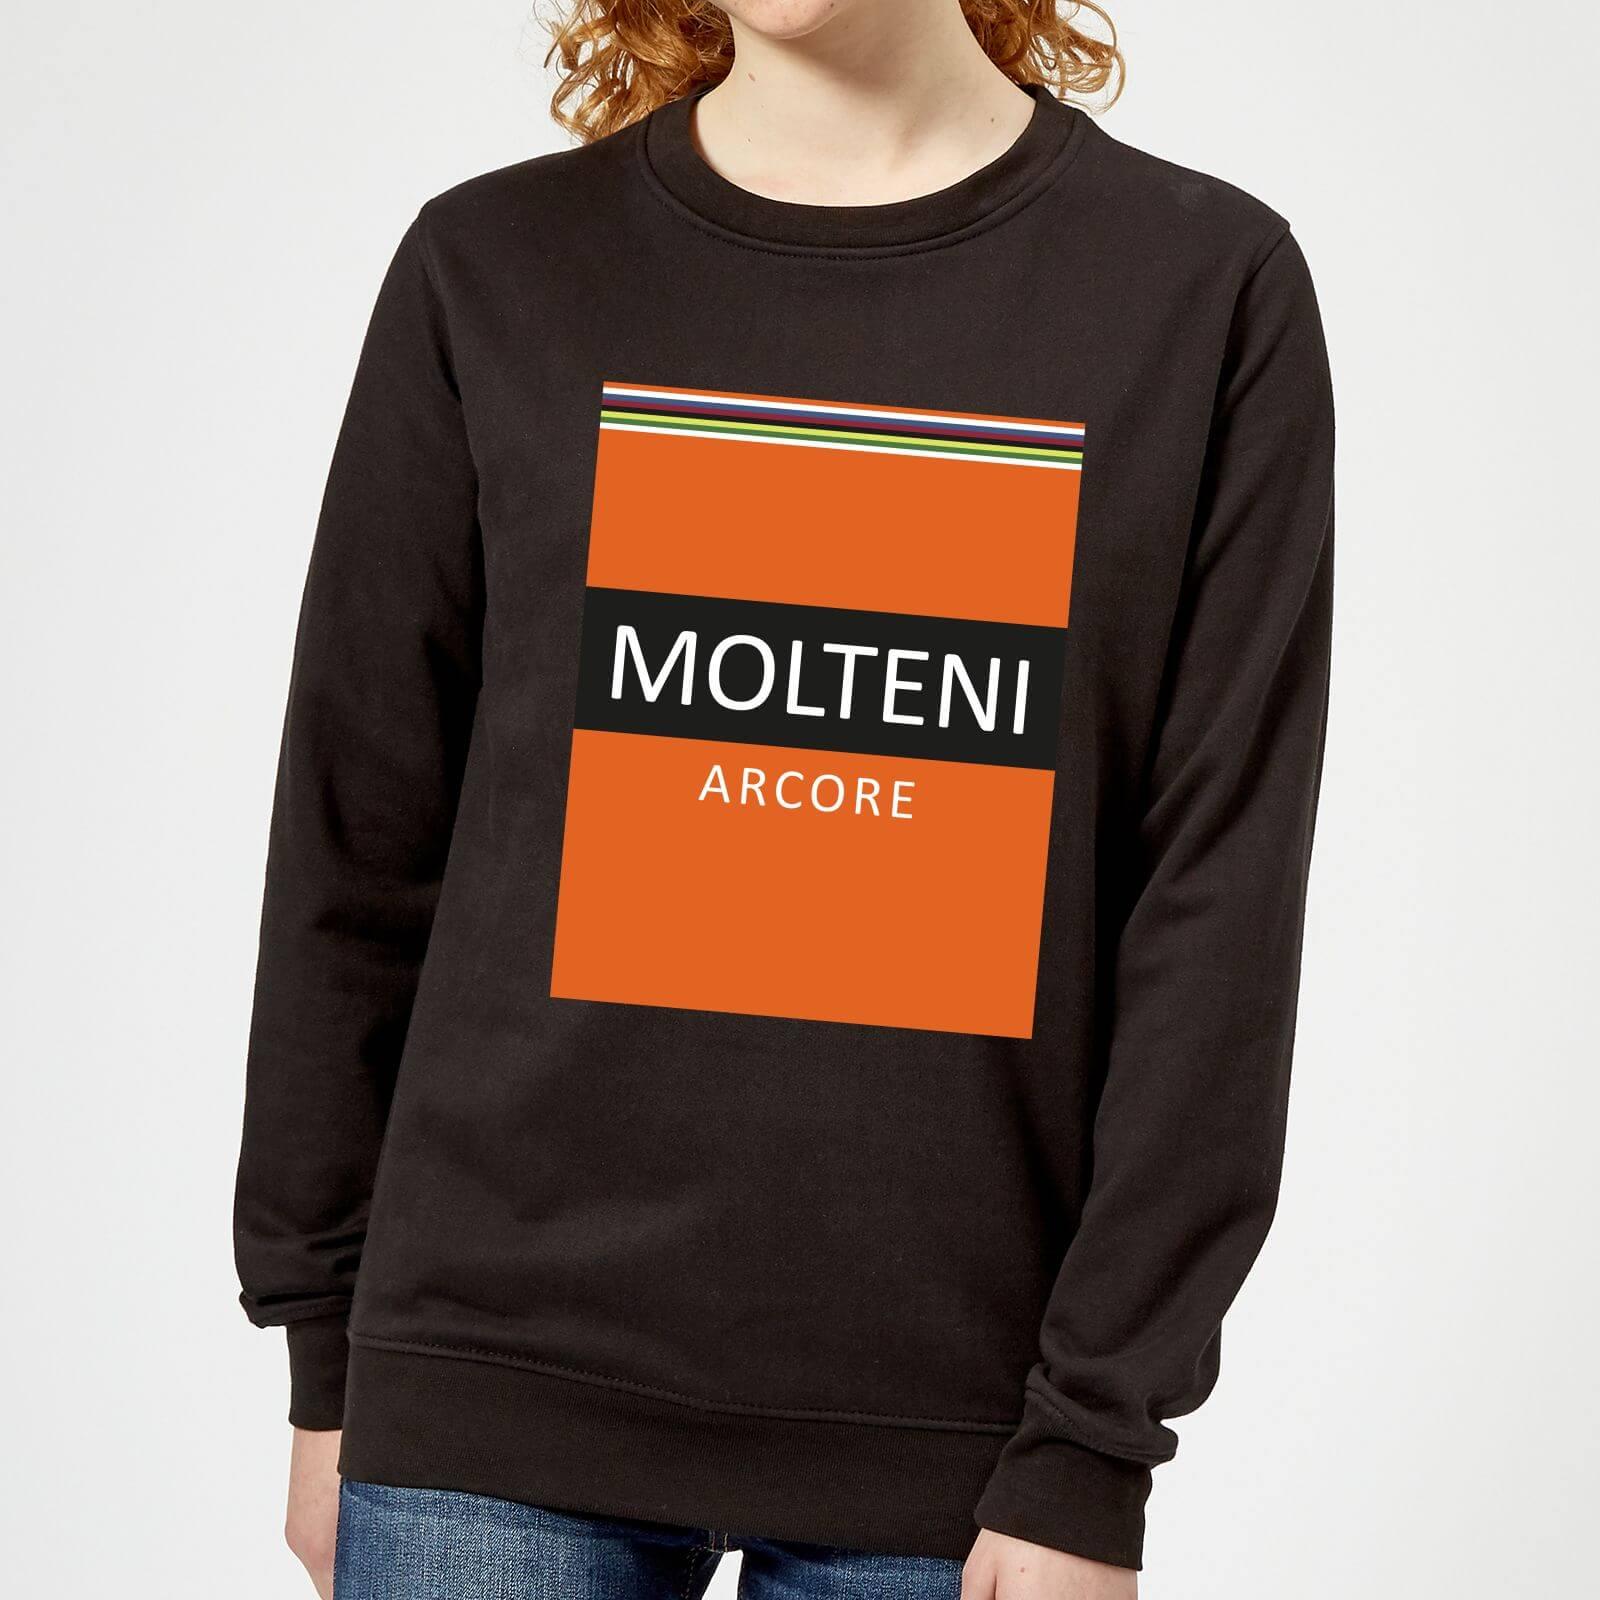 Summit Finish Molteni Women's Sweatshirt - Black - S - Black